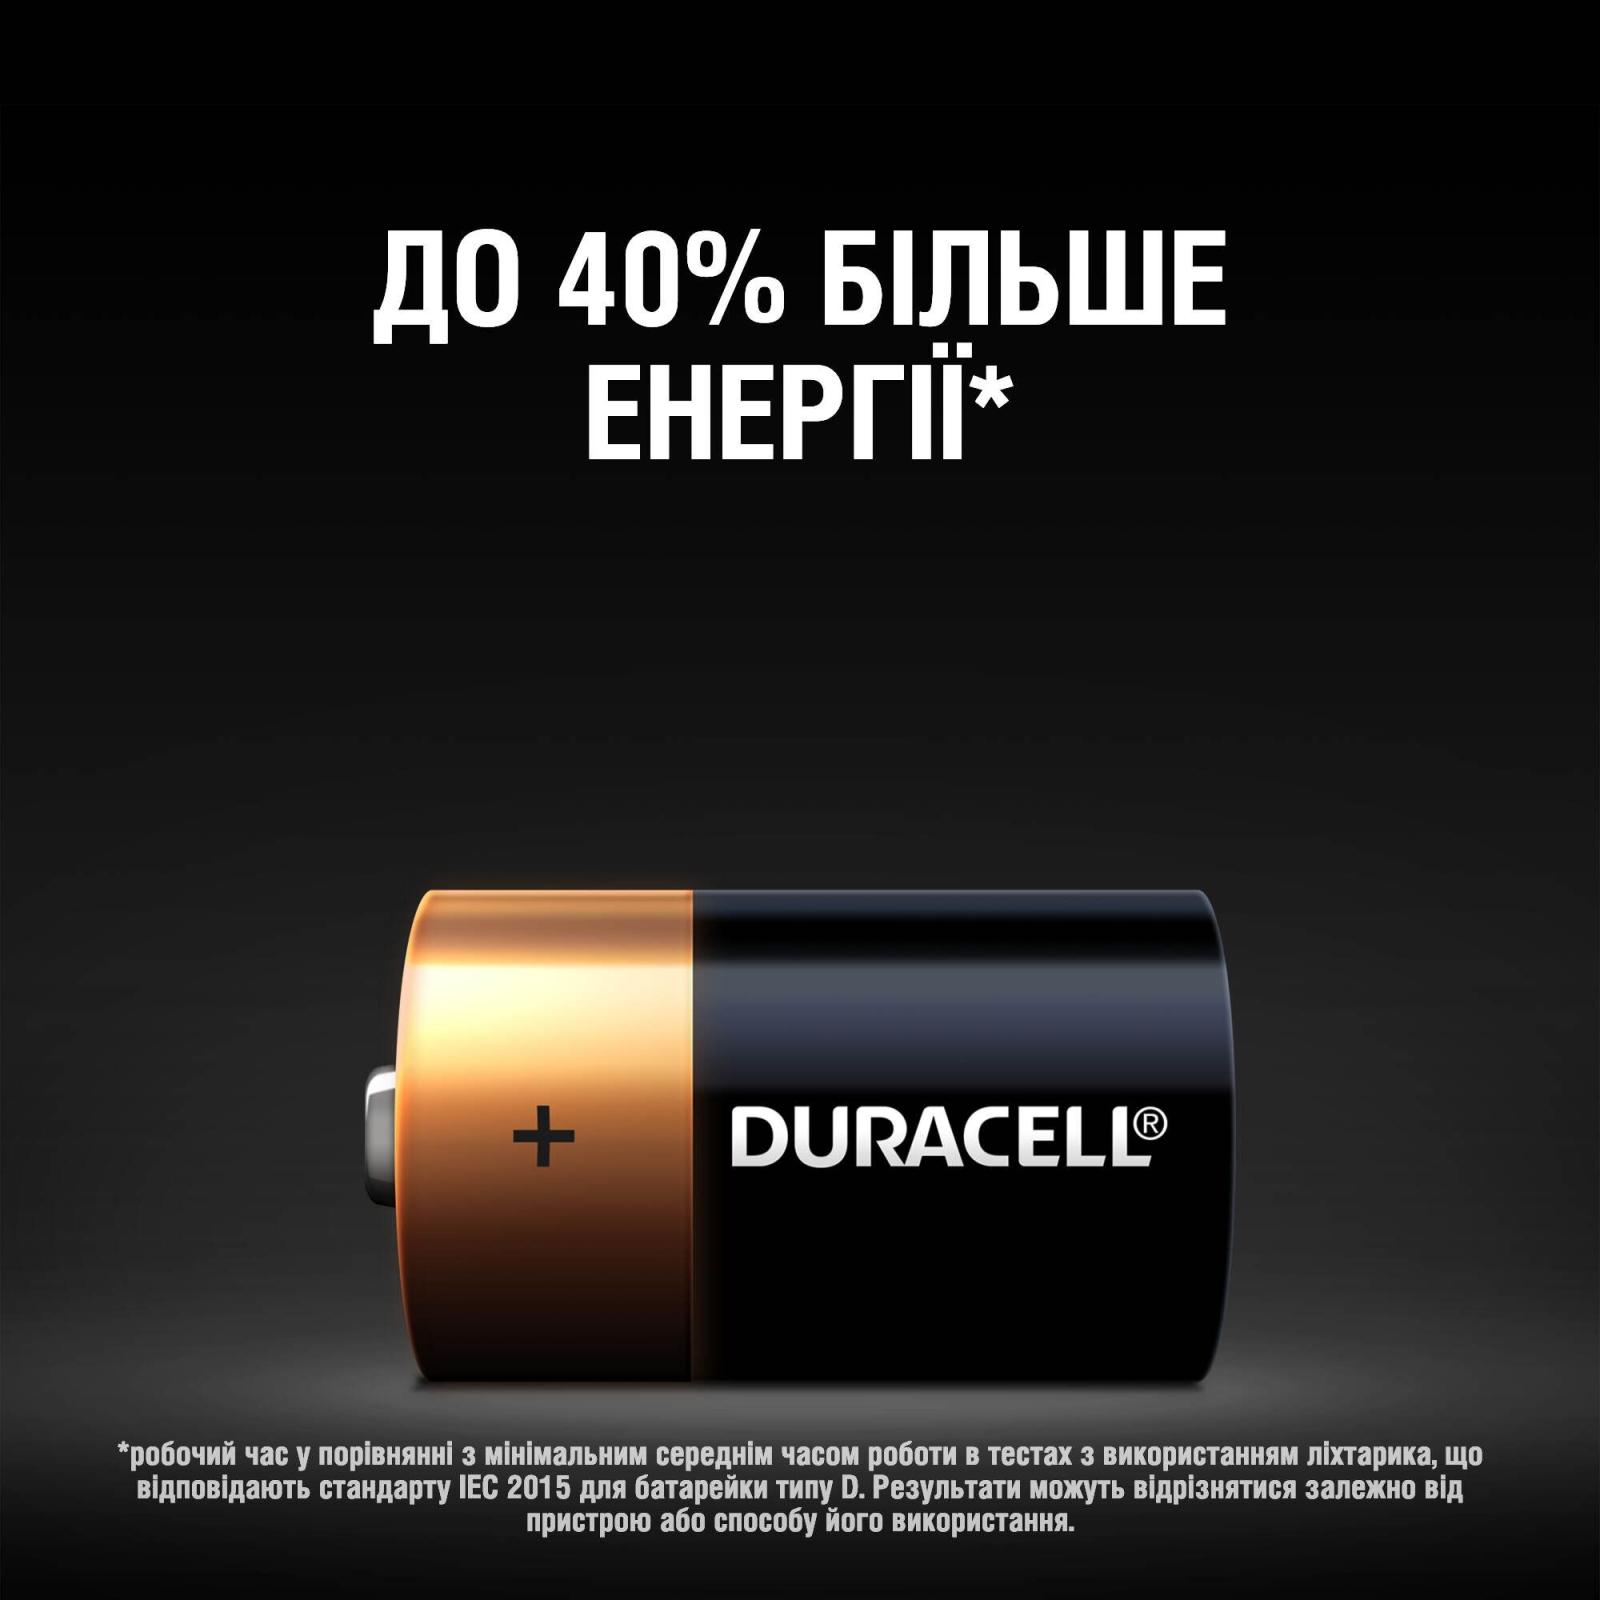 Батарейка Duracell D LR20 * 2 (5000394052512 / 81483648) изображение 4